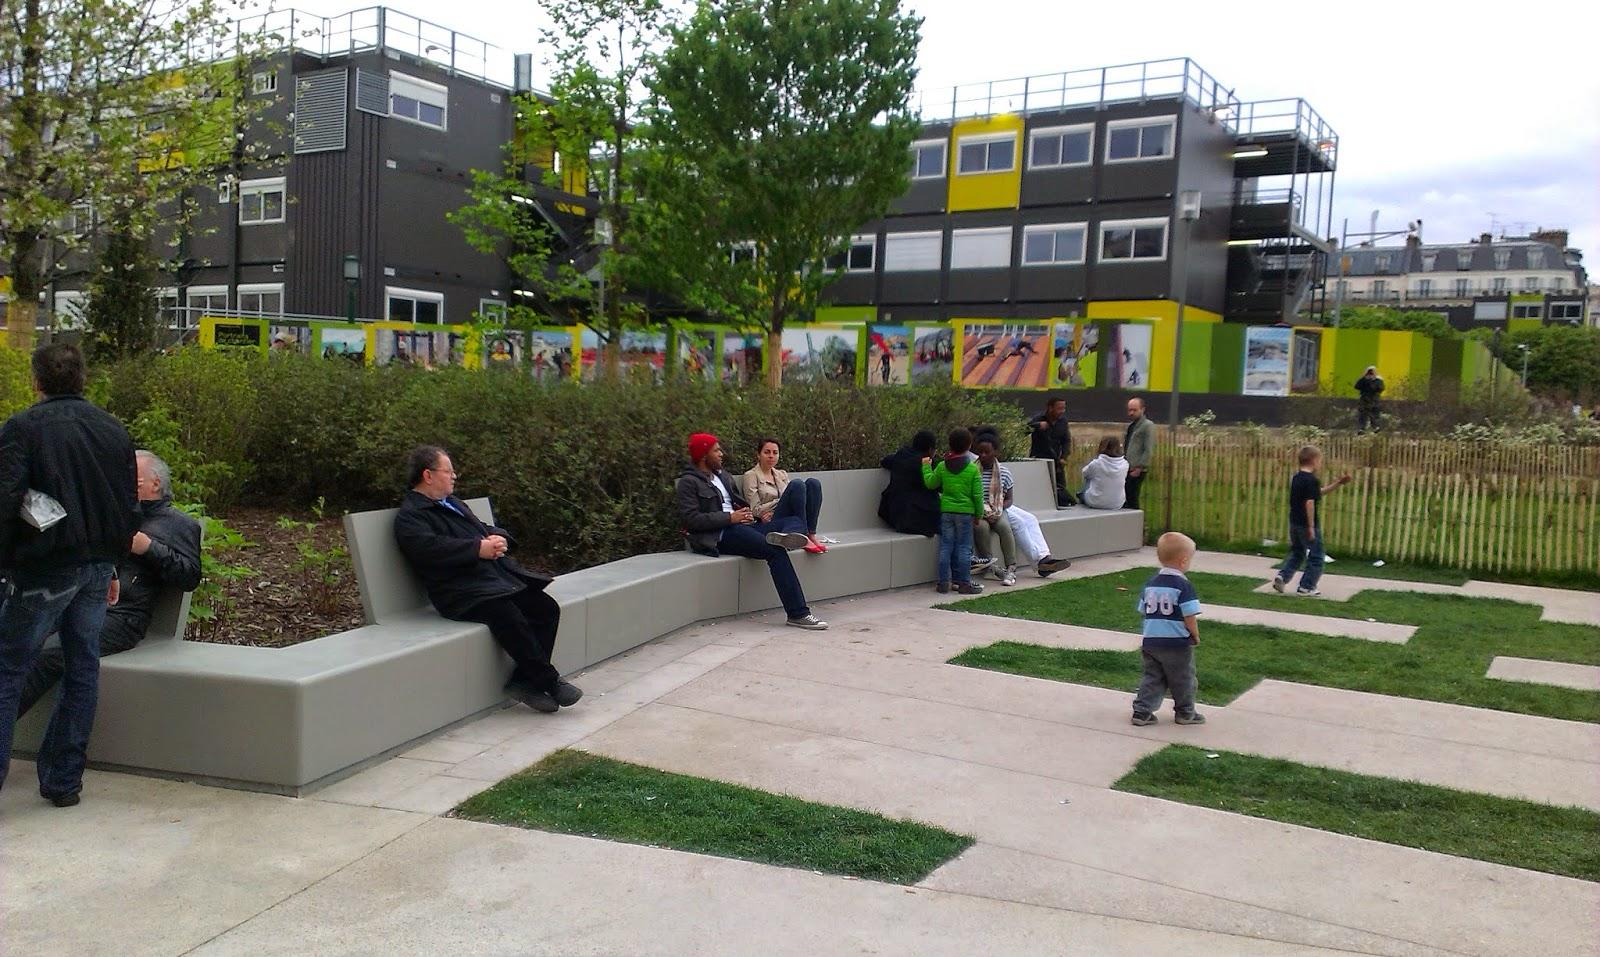 Preferenza Jardin Nelson Mandela, Quartier des Halles, Paris - France _ Seura  FZ59